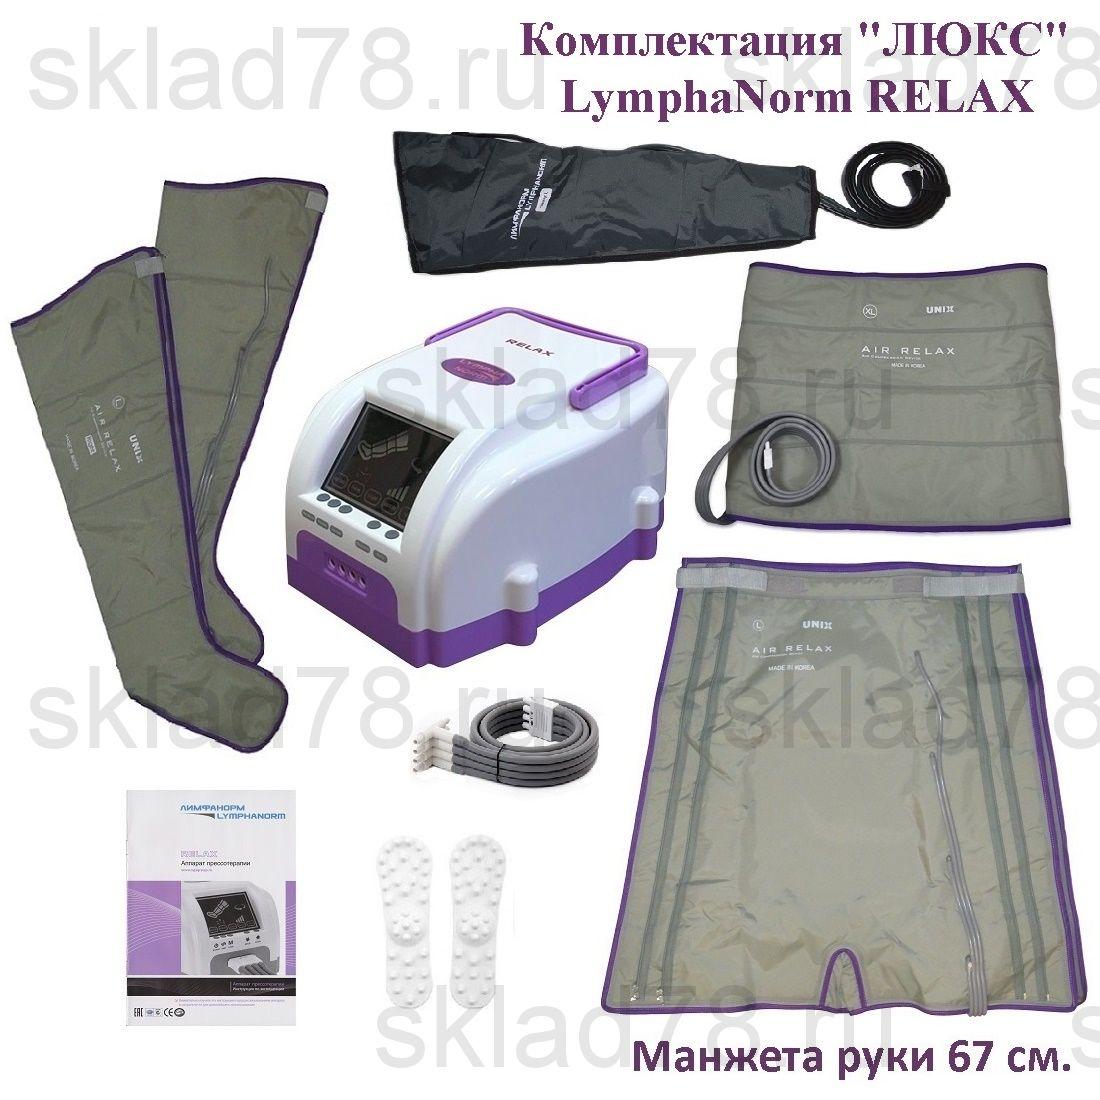 LymphaNorm RELAX Лимфодренаж «ЛЮКС» (рука 67 см.)